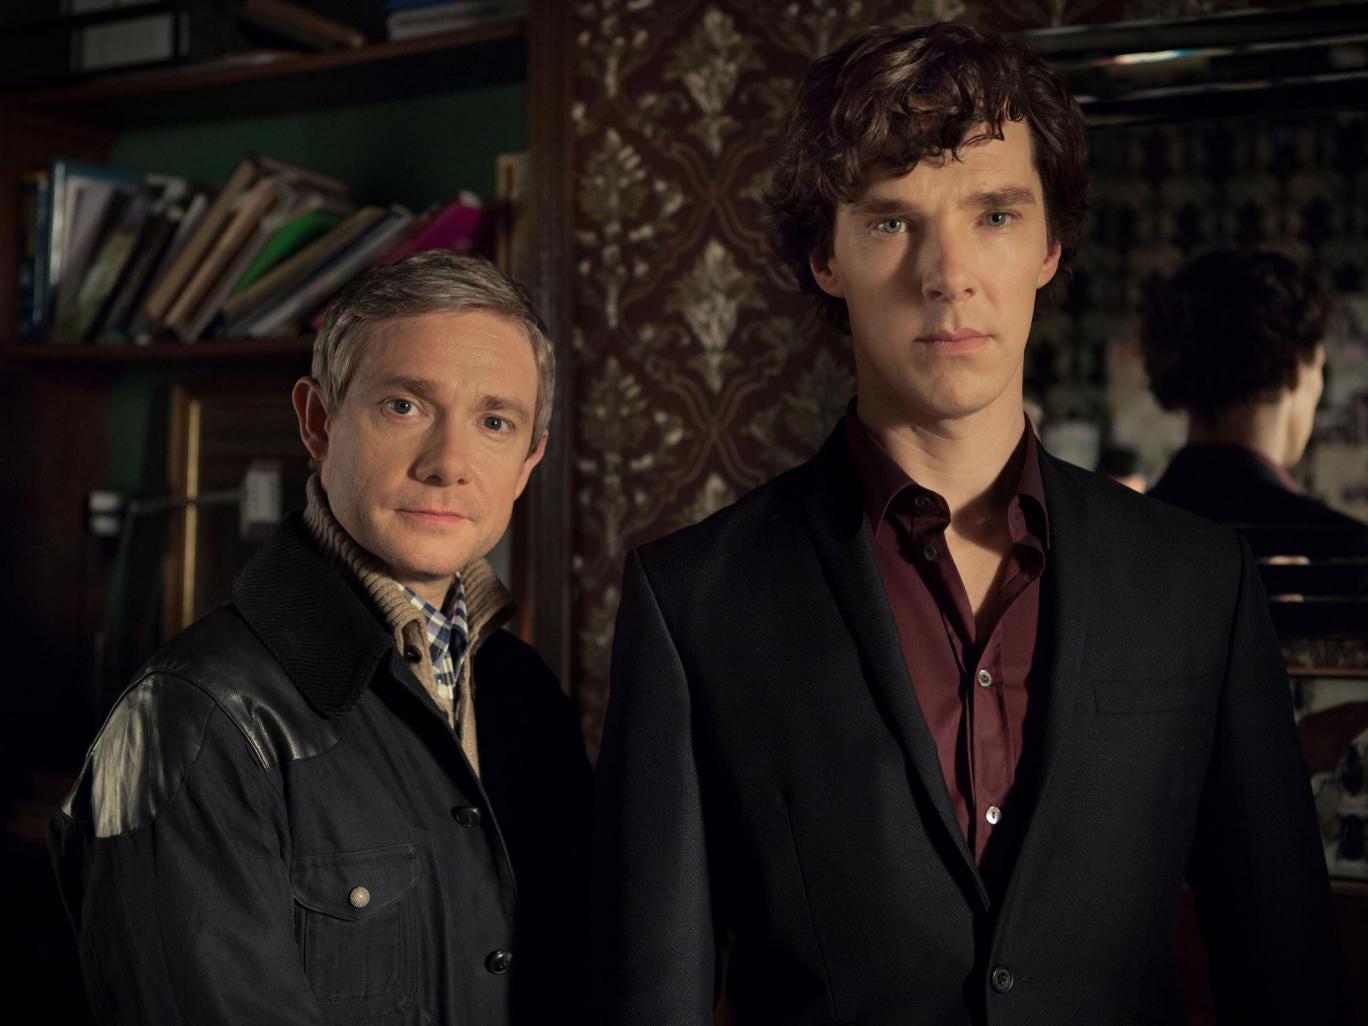 Martin Freeman and Benedict Cumberbatch as John Watson and Sherlock Holmes in Sherlock